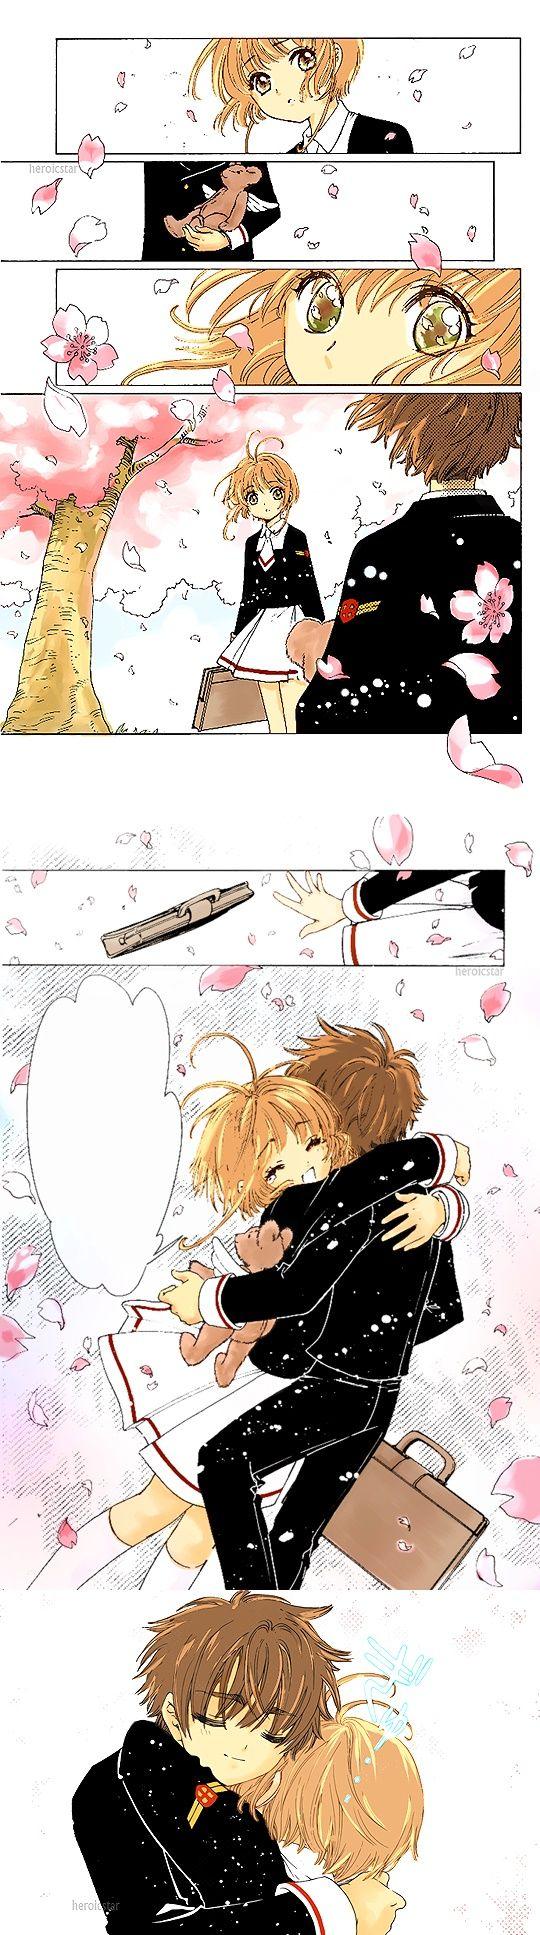 """There are so many things I want to tell you! So many things I wanted to say in person!"" ""There's a lot for me too! So many things I want you to know. So many things I want to say."" ""Tell me everything!"" ""Yeah."" | Cardcaptor Sakura 2016 manga"